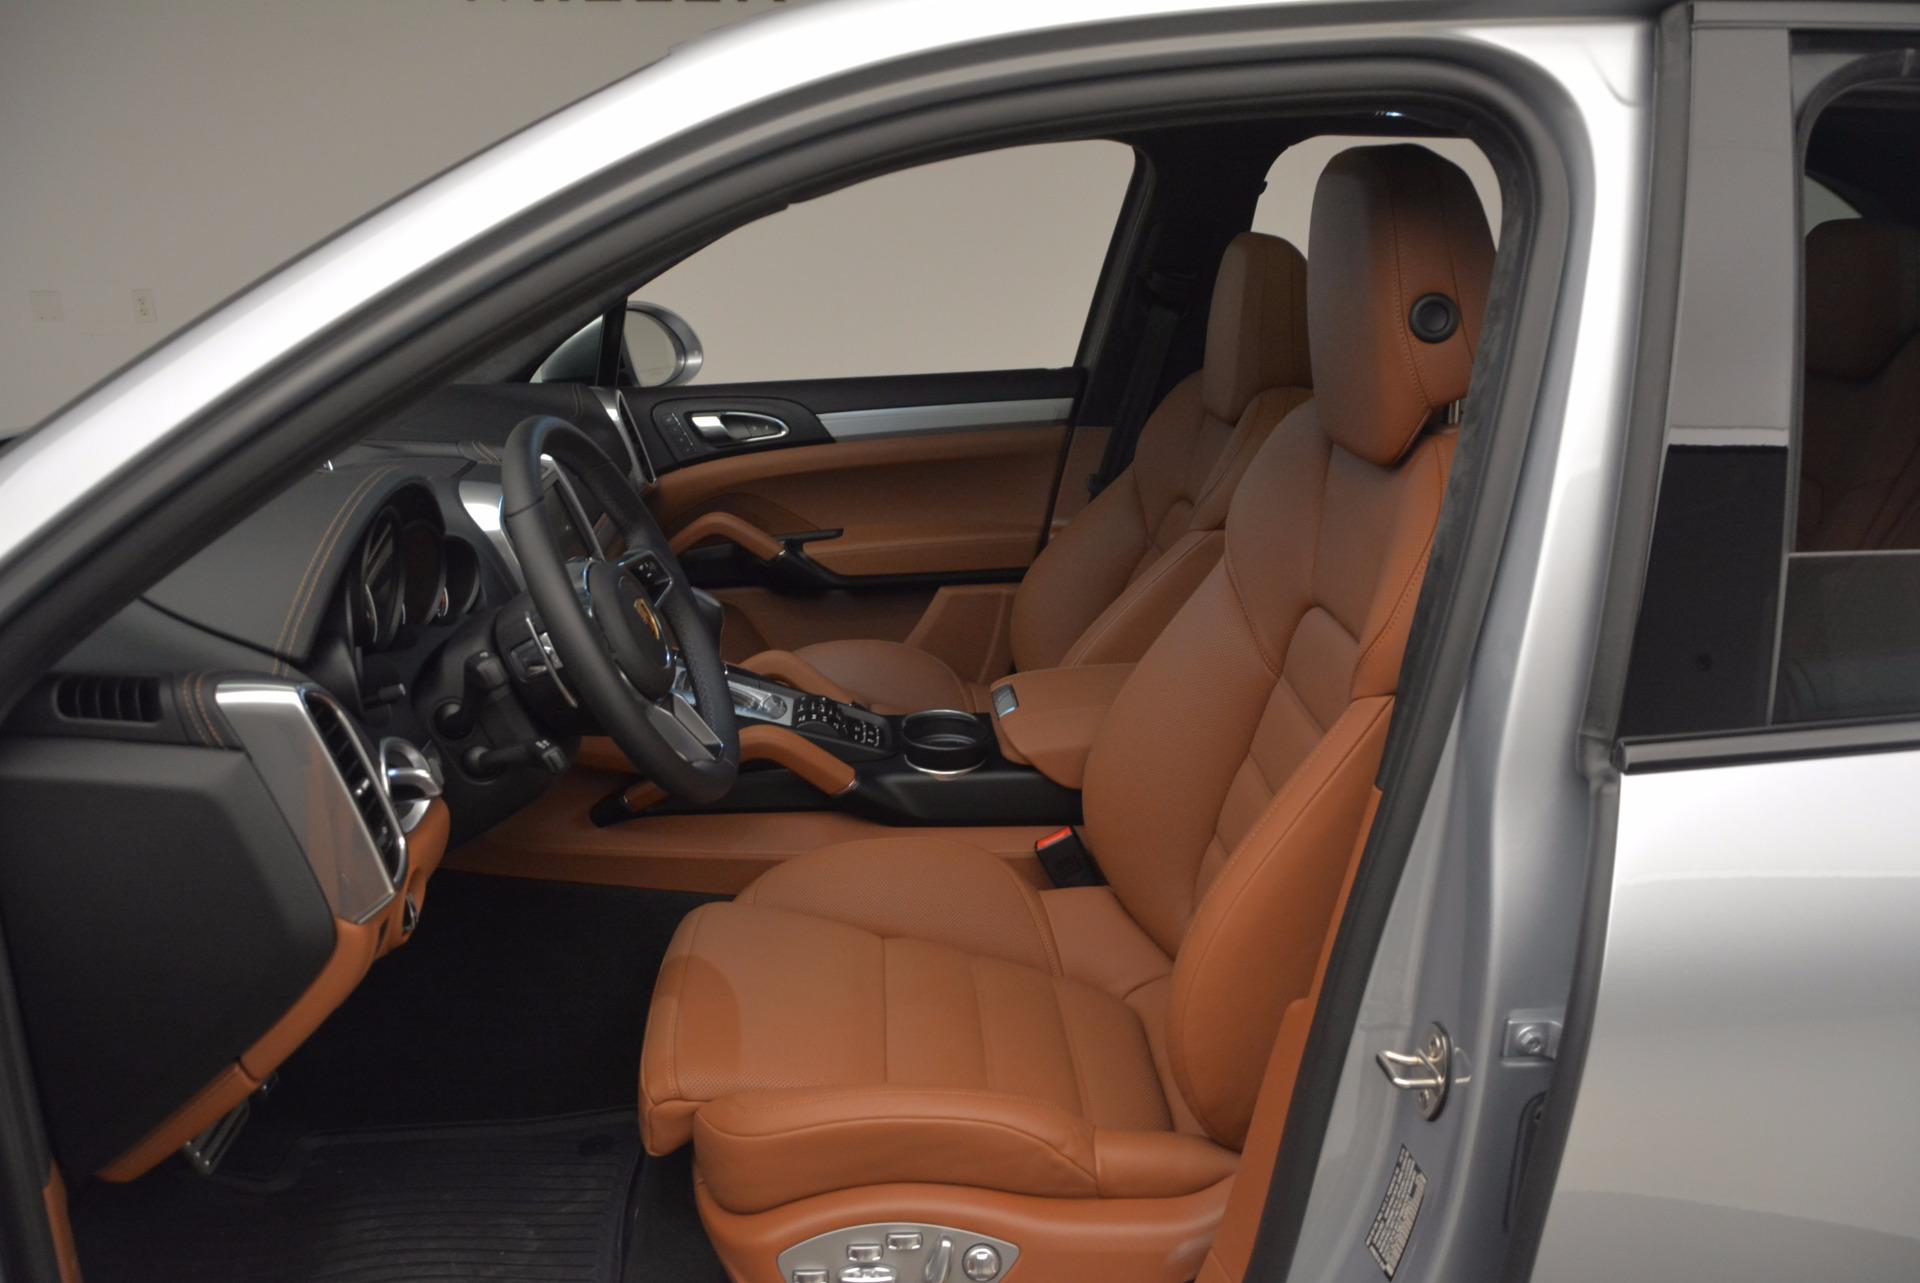 Used 2016 Porsche Cayenne Turbo For Sale In Greenwich, CT. Alfa Romeo of Greenwich, 7165 1000_p19